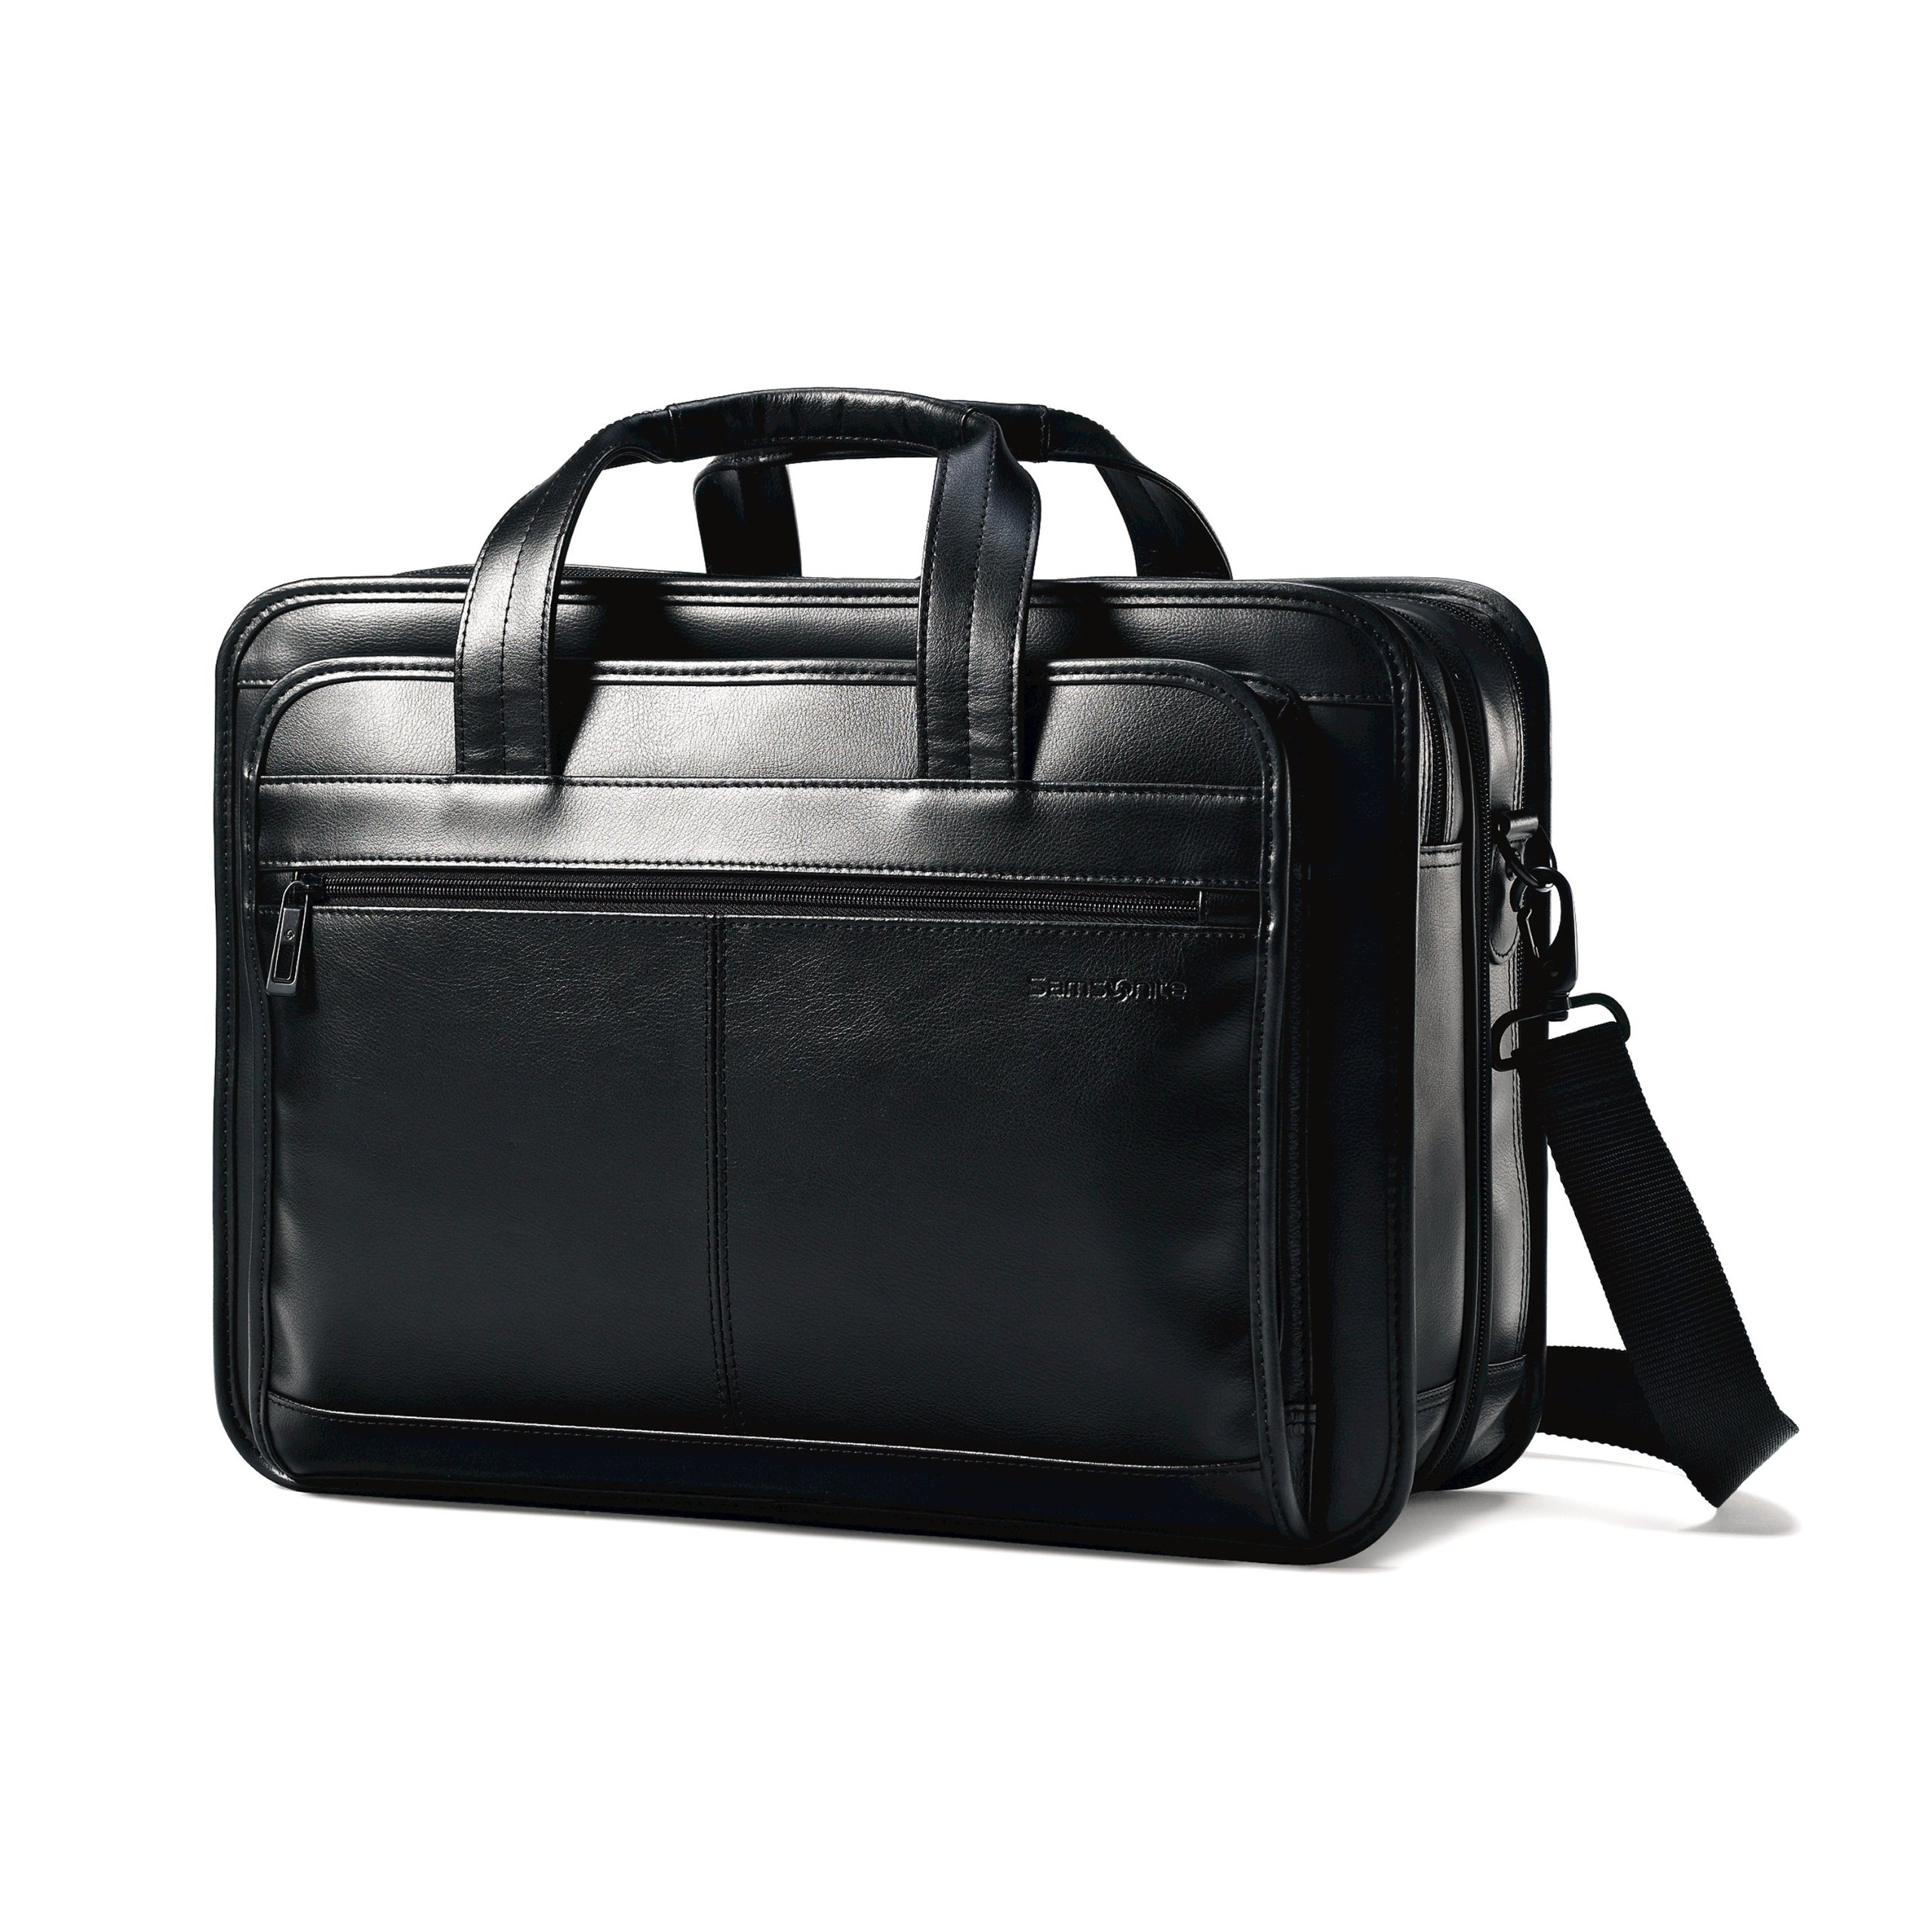 Samsonite Leather Expandable Briefcase Black